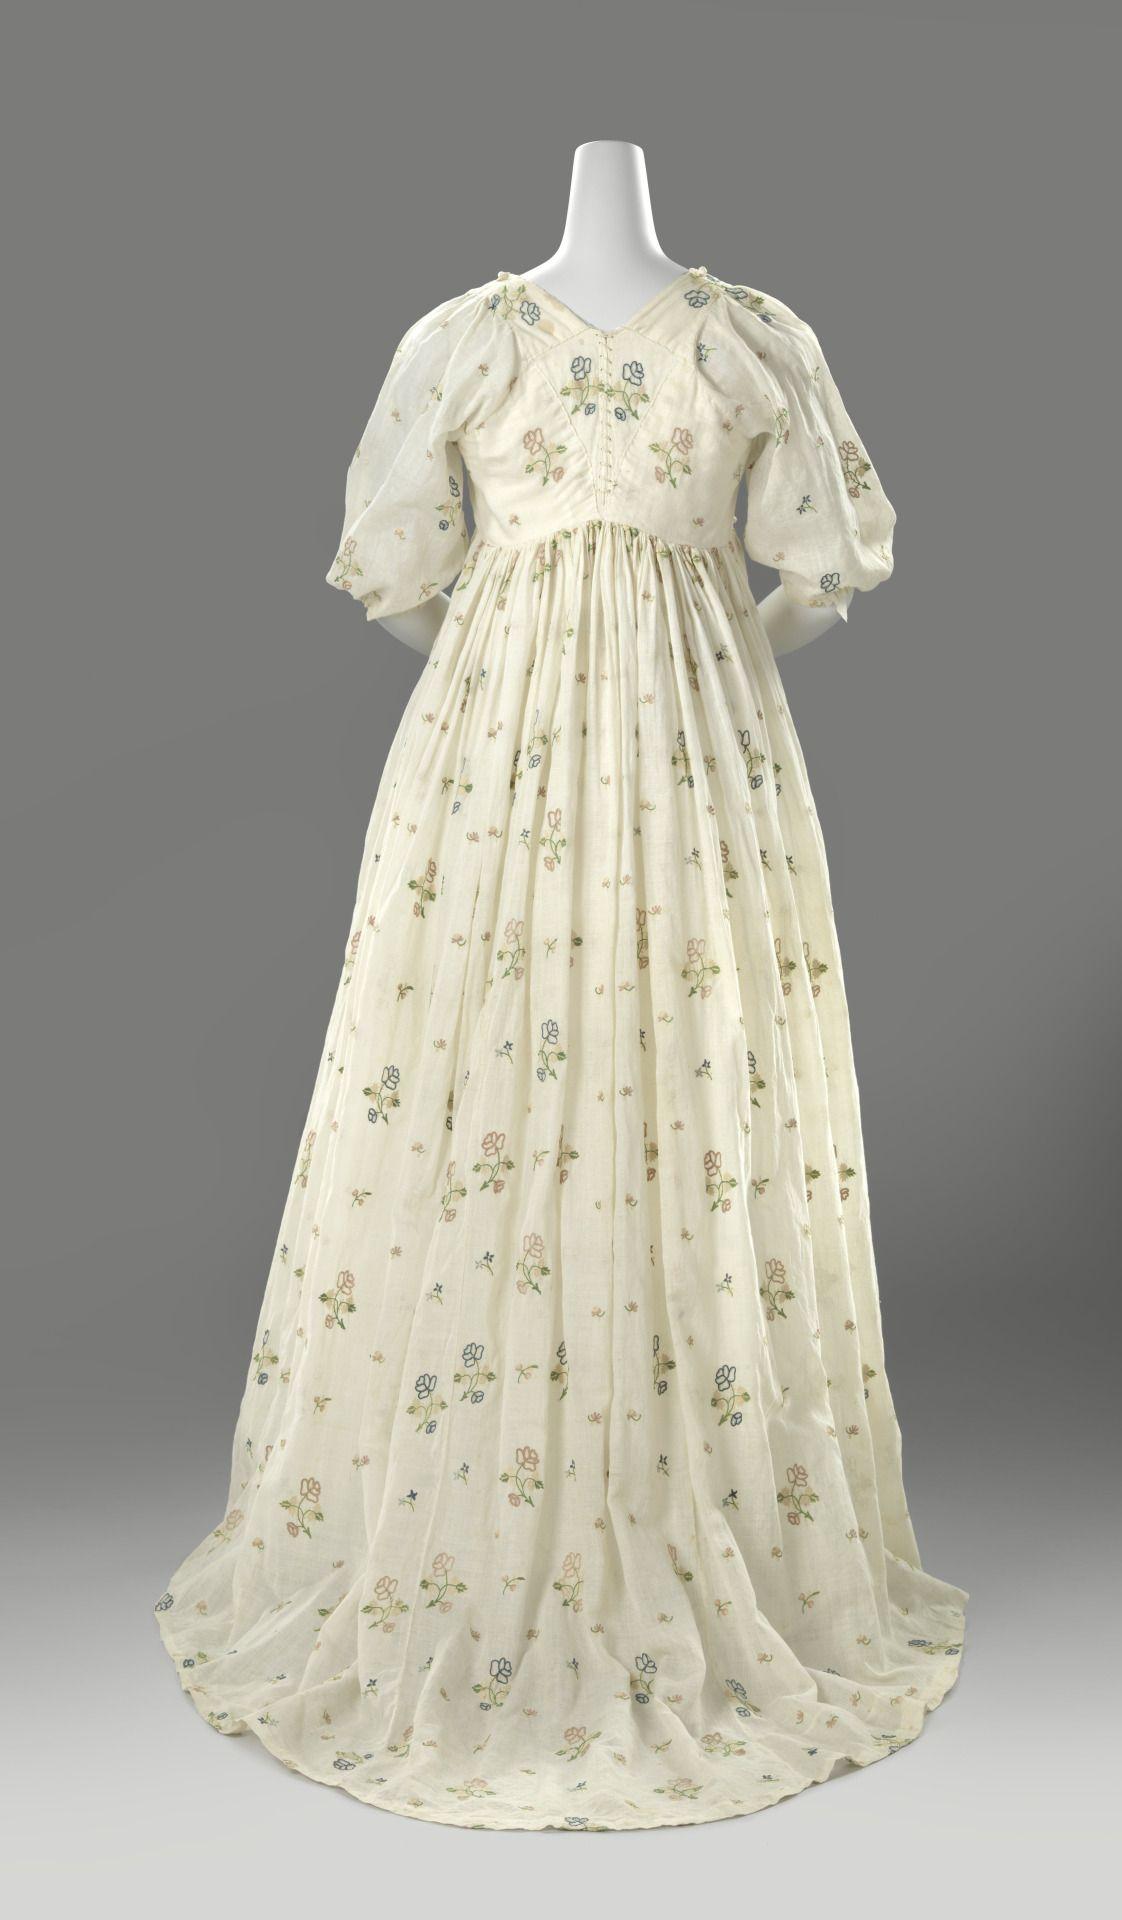 Fashionsfromhistory dress c rijksmuseum the london life